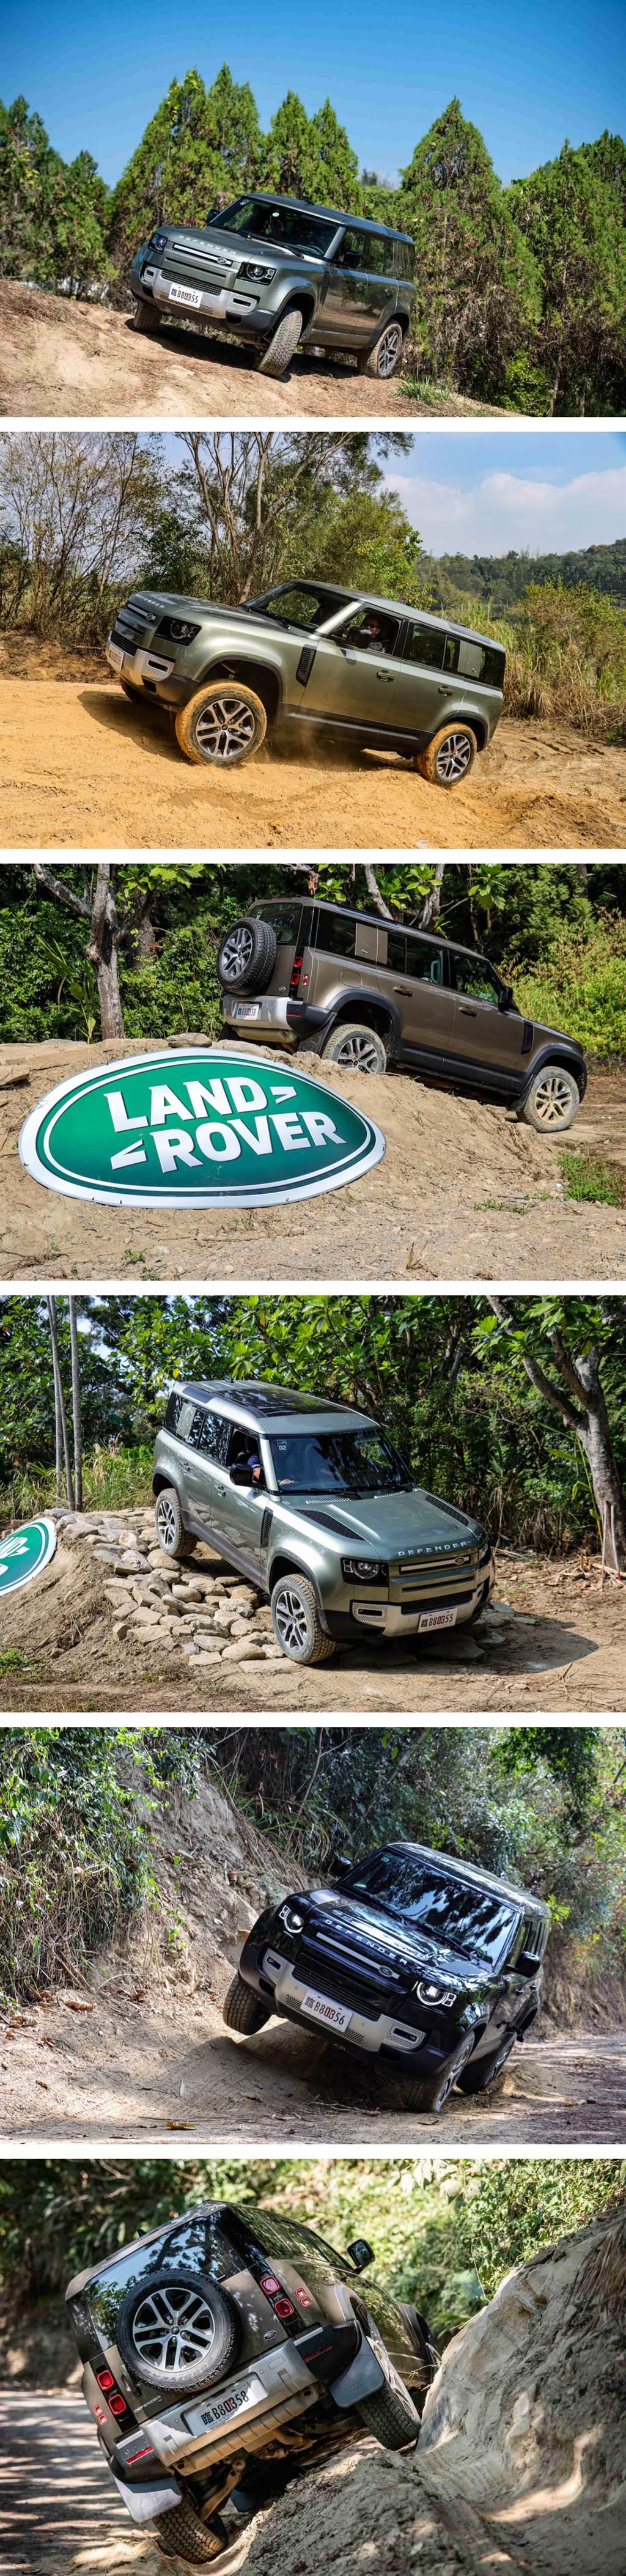 創新傳塑經典、持續征途世界,2021 Land Rover Defender P300 HSE